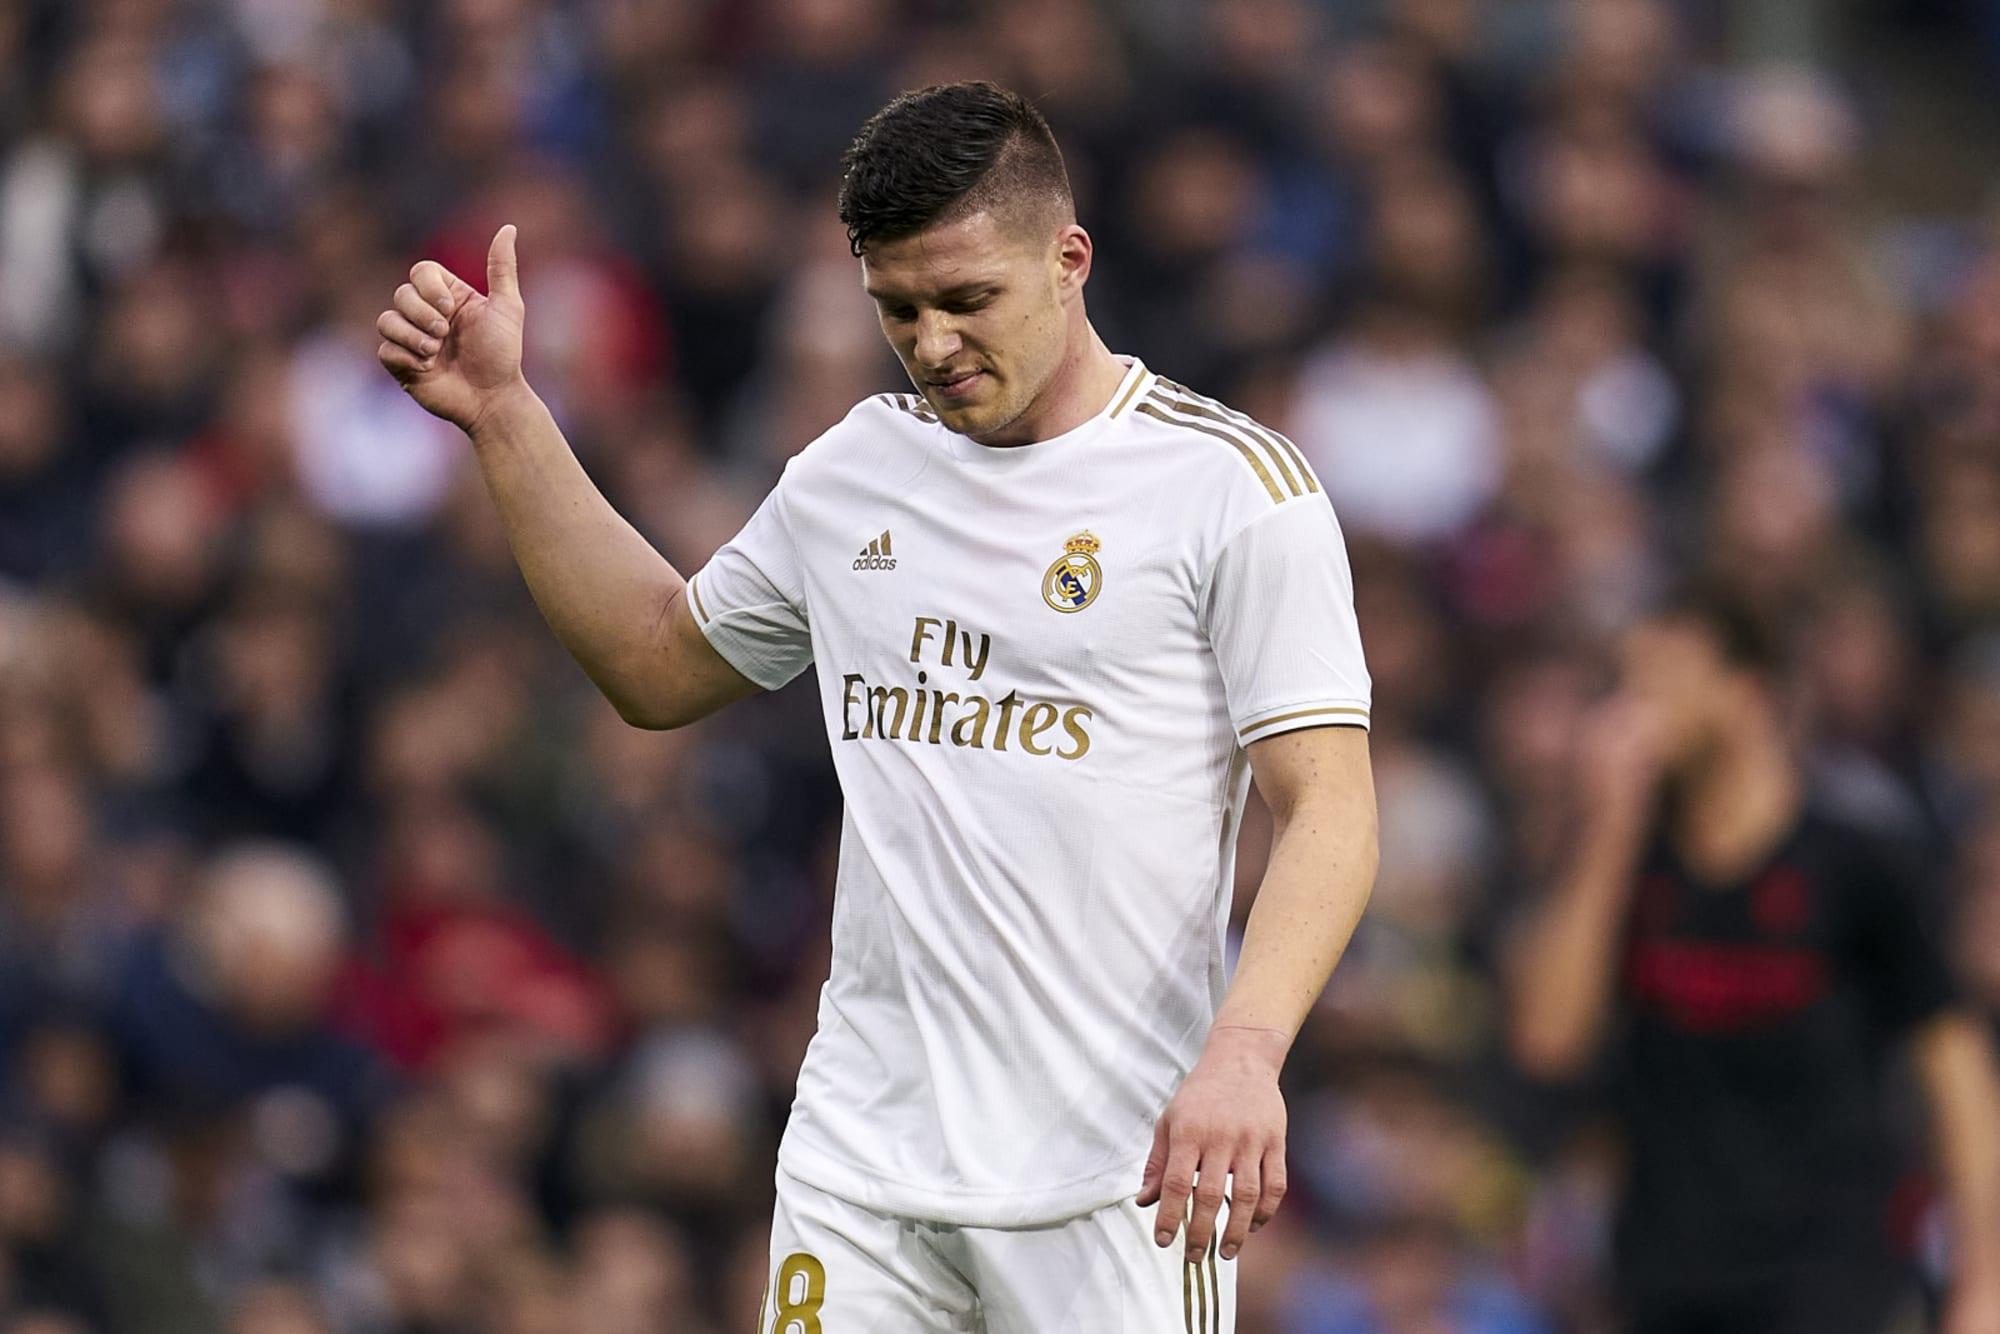 Real Madrid: Zinedine Zidane can unlock Luka Jovic's potential